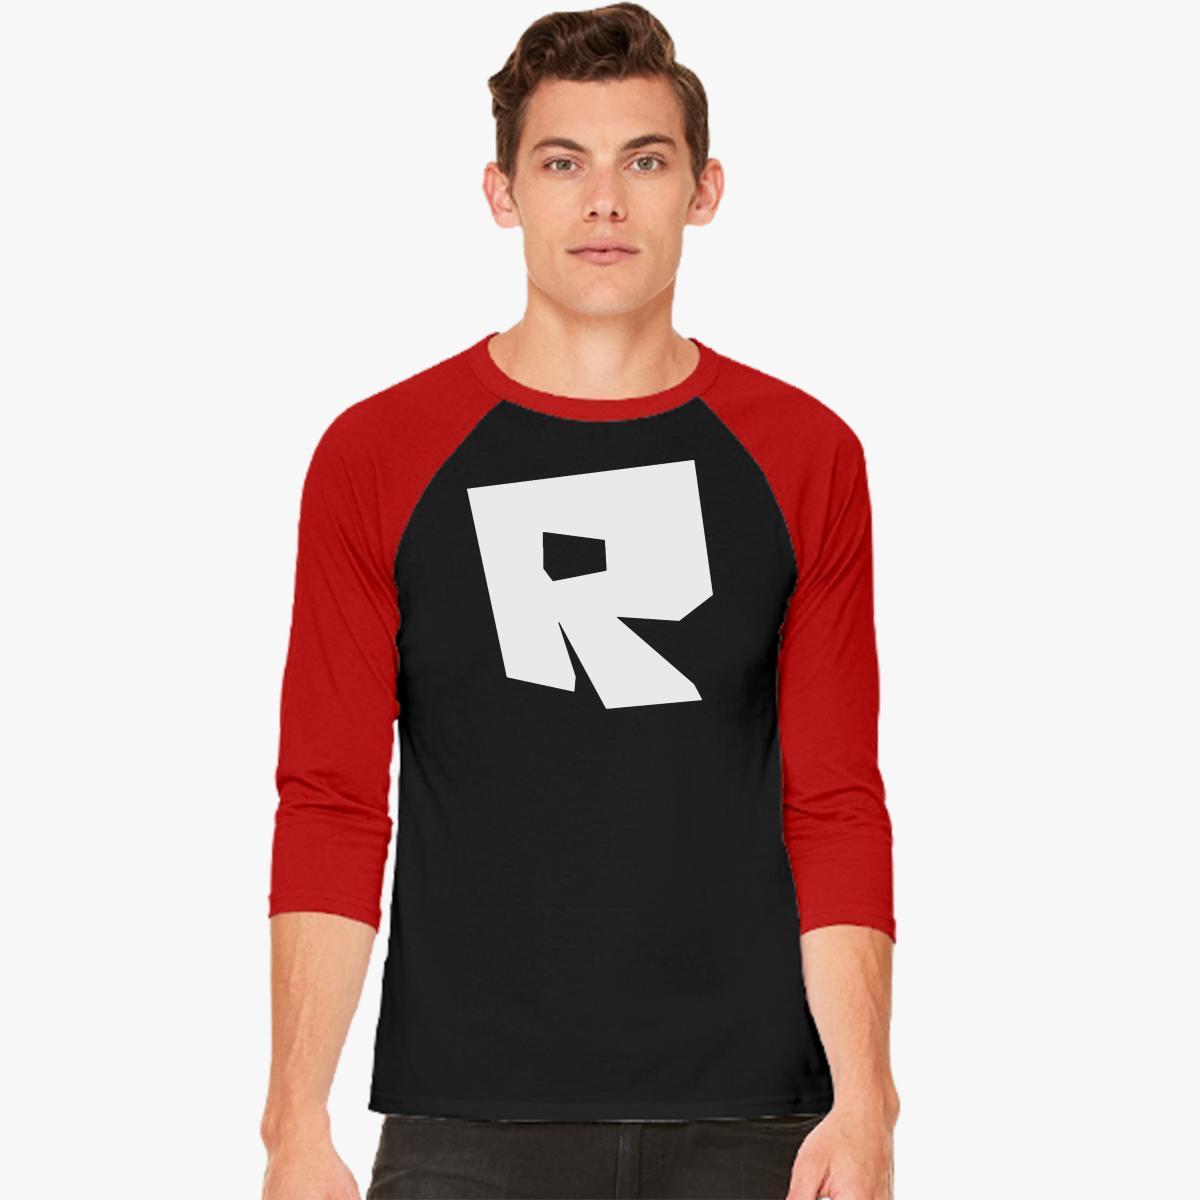 Custom Roblox Shirt Maker Rldm